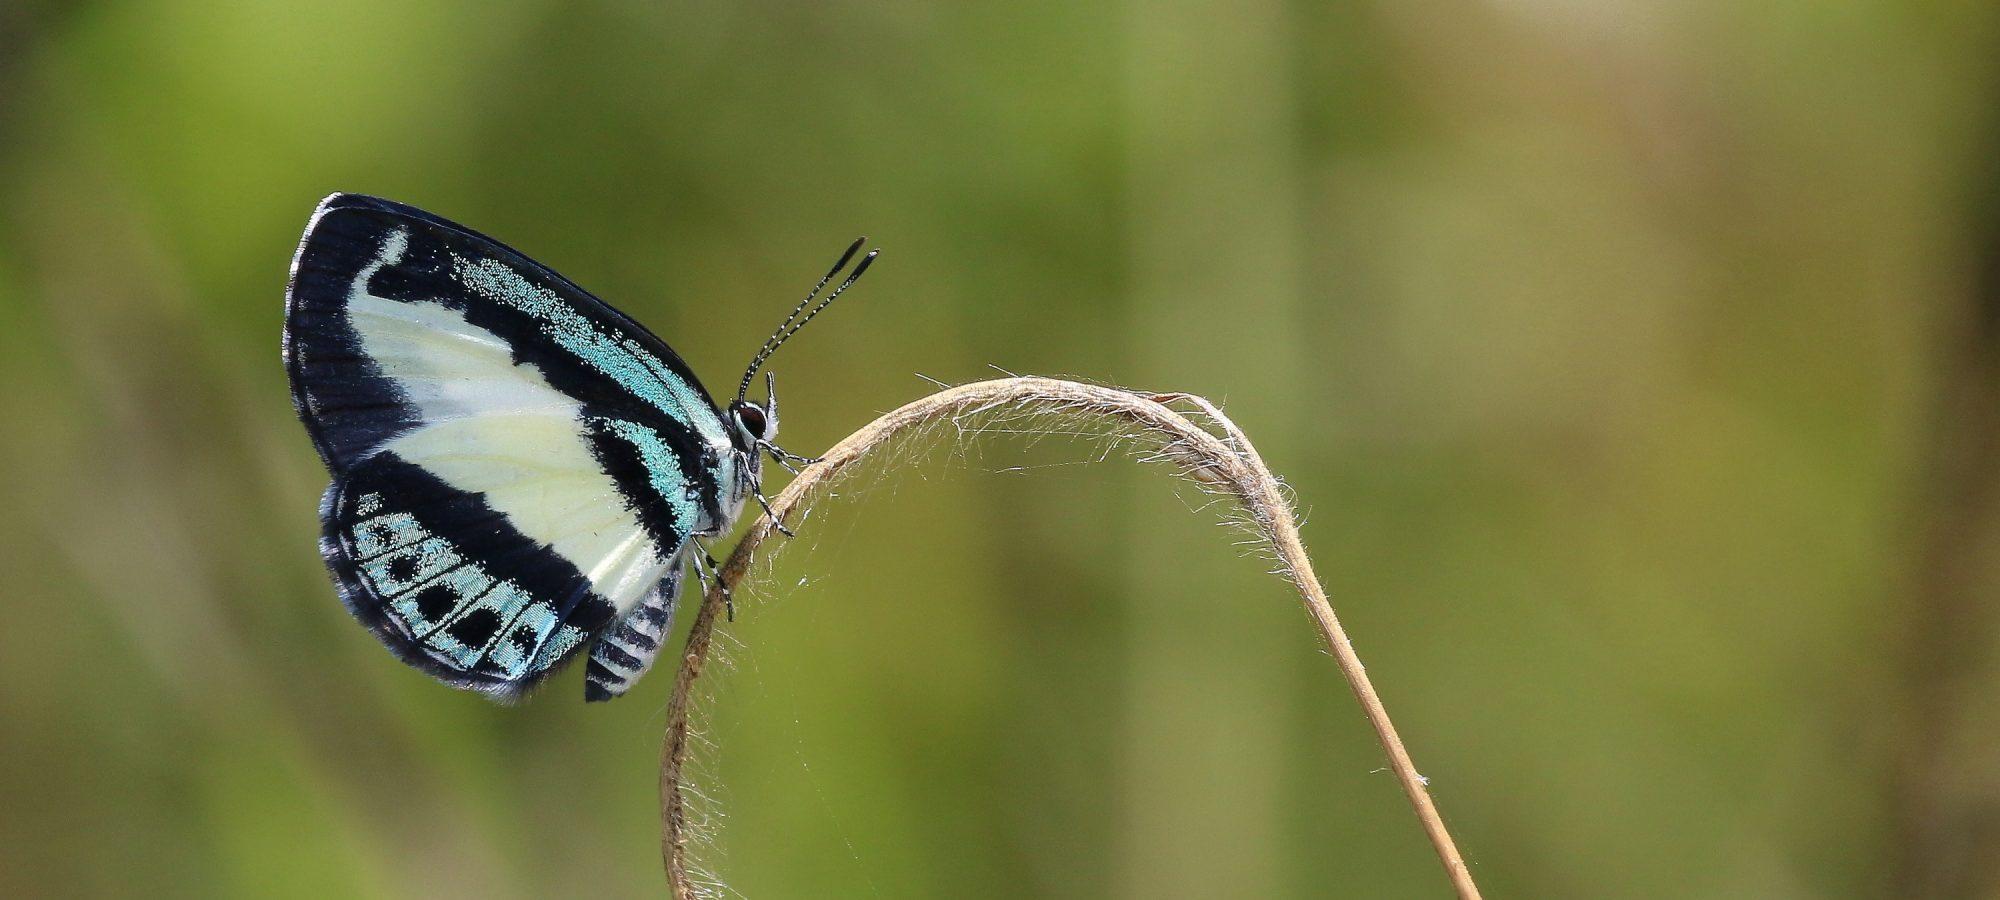 Australian butterflies www.purvision.com